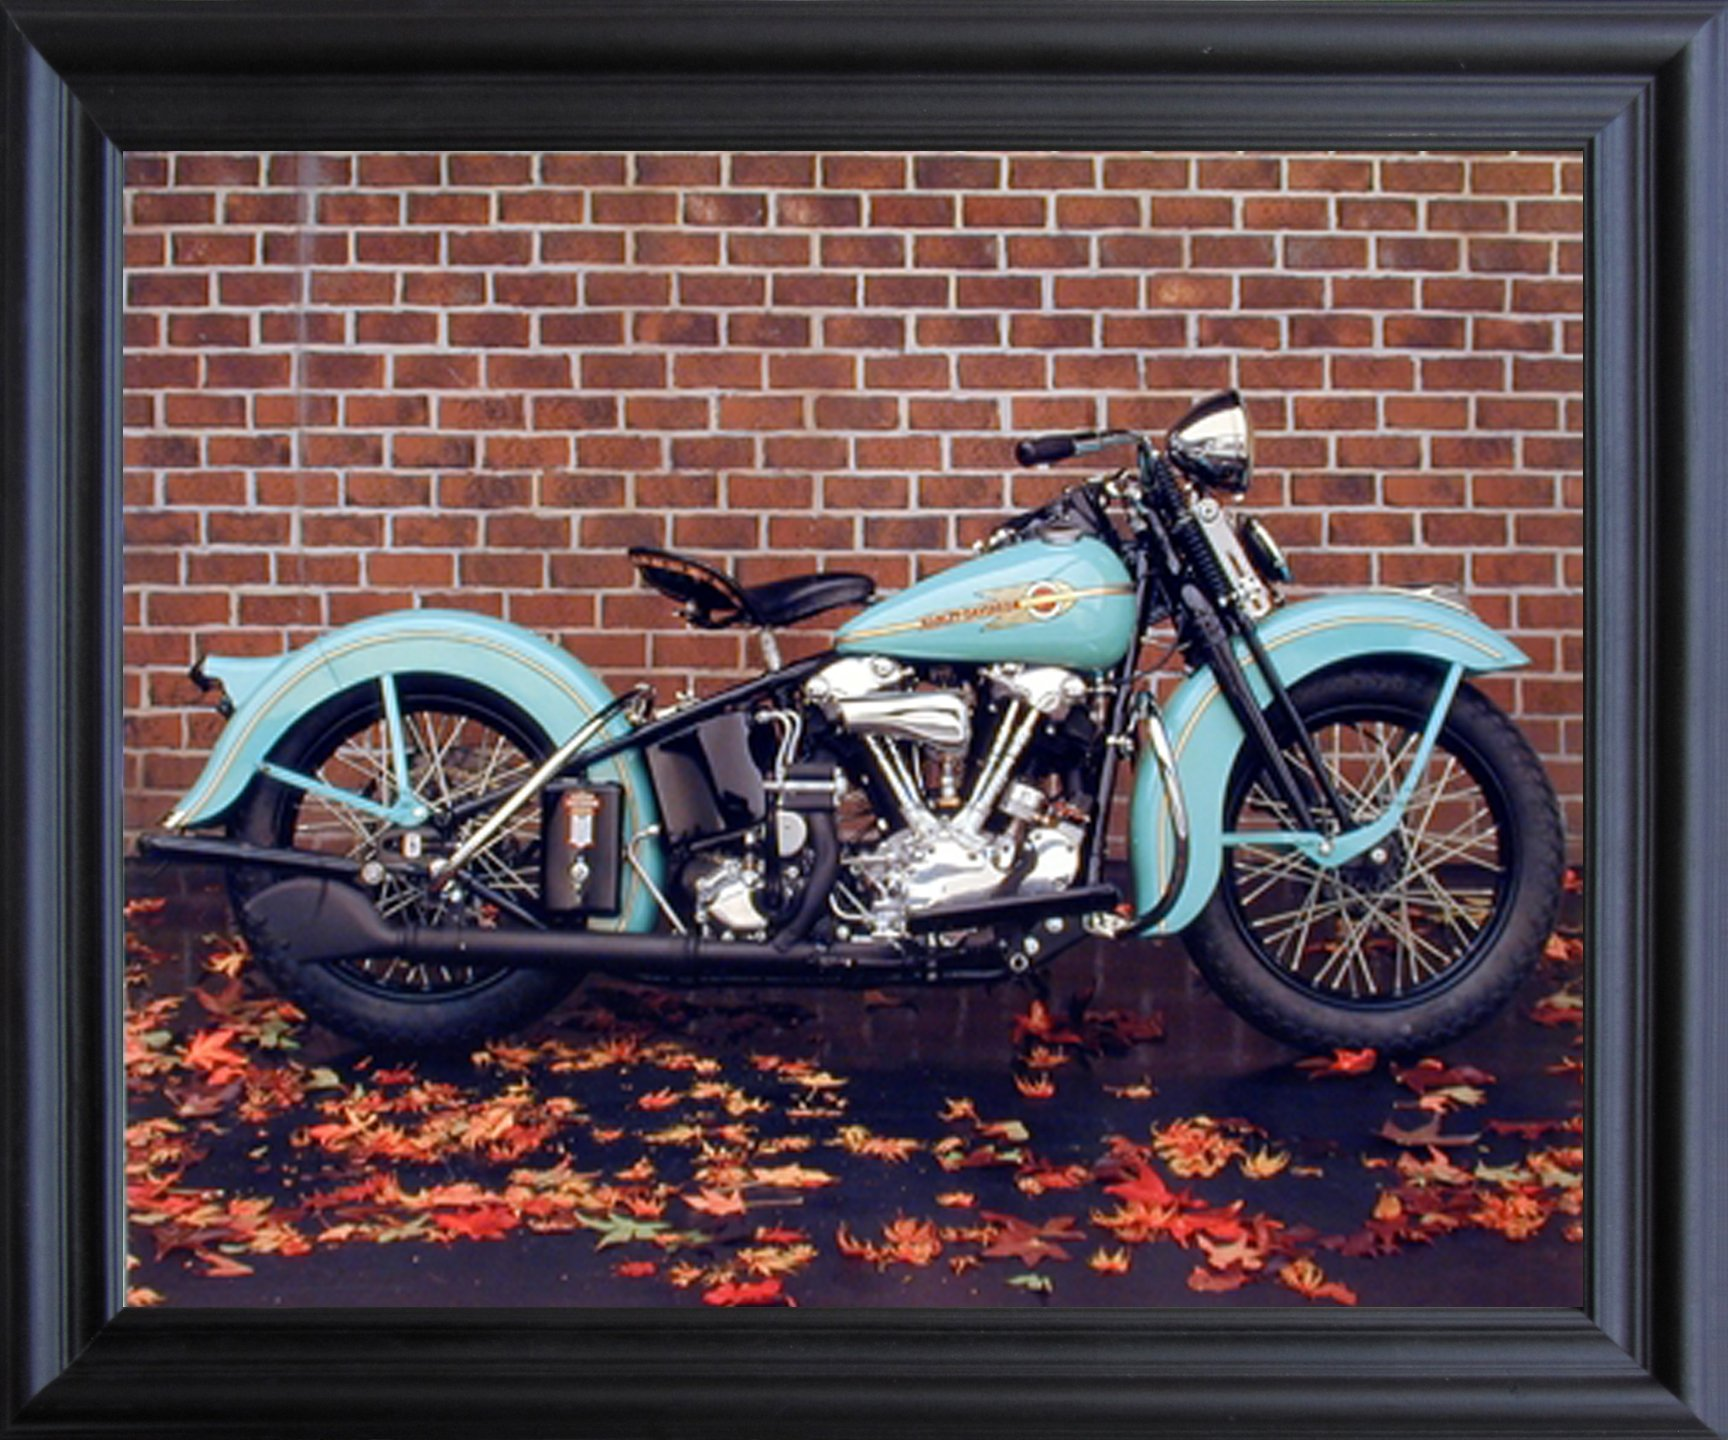 1938 Aqua Harley Davidson Ron Kimball Vintage Motorcycle